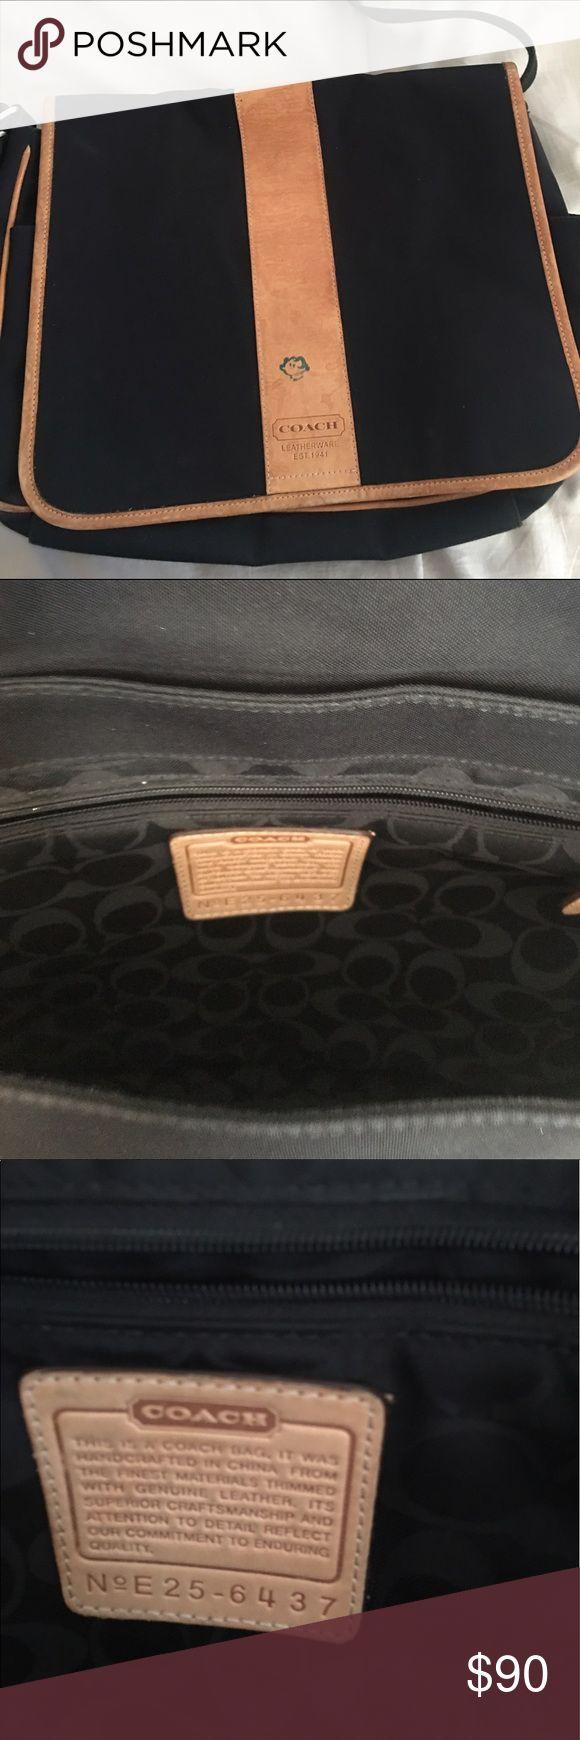 Coach messenger bag LARGE COACH BLACK TRANSATLANTIC MESSENGER CROSSBODY HANDBAG #E25-6437 LAPTOP BAG! Coach Bags Laptop Bags